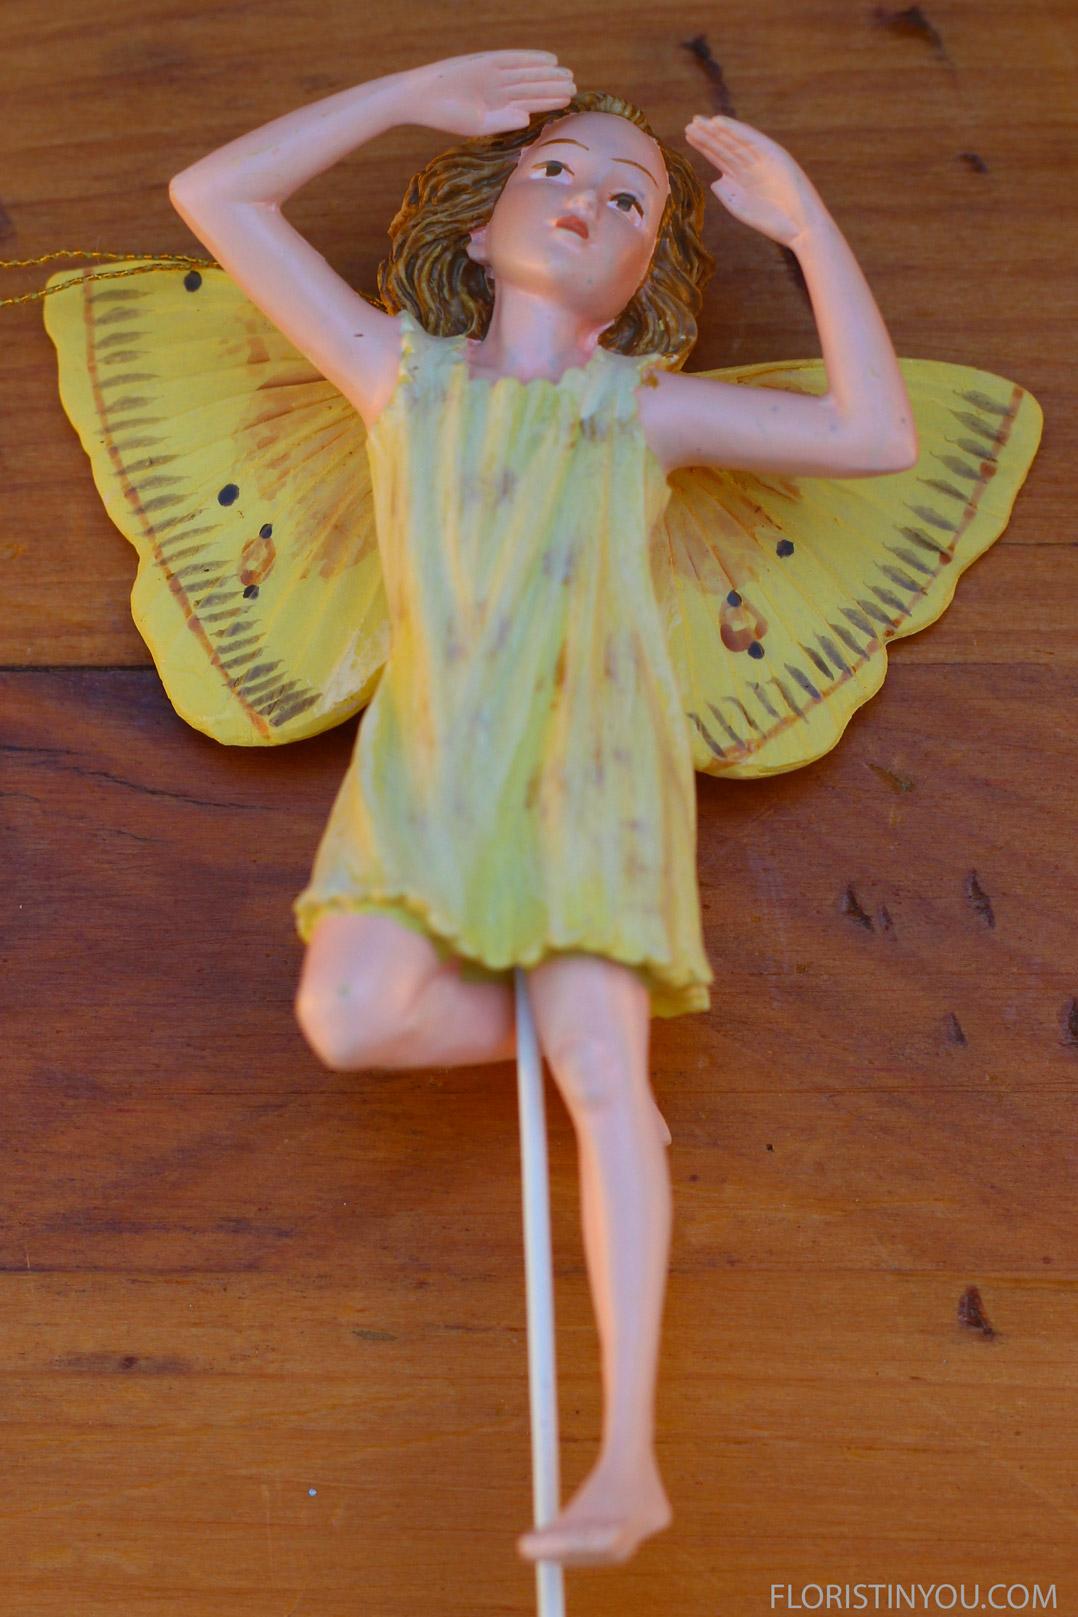 Put fairy on stand.